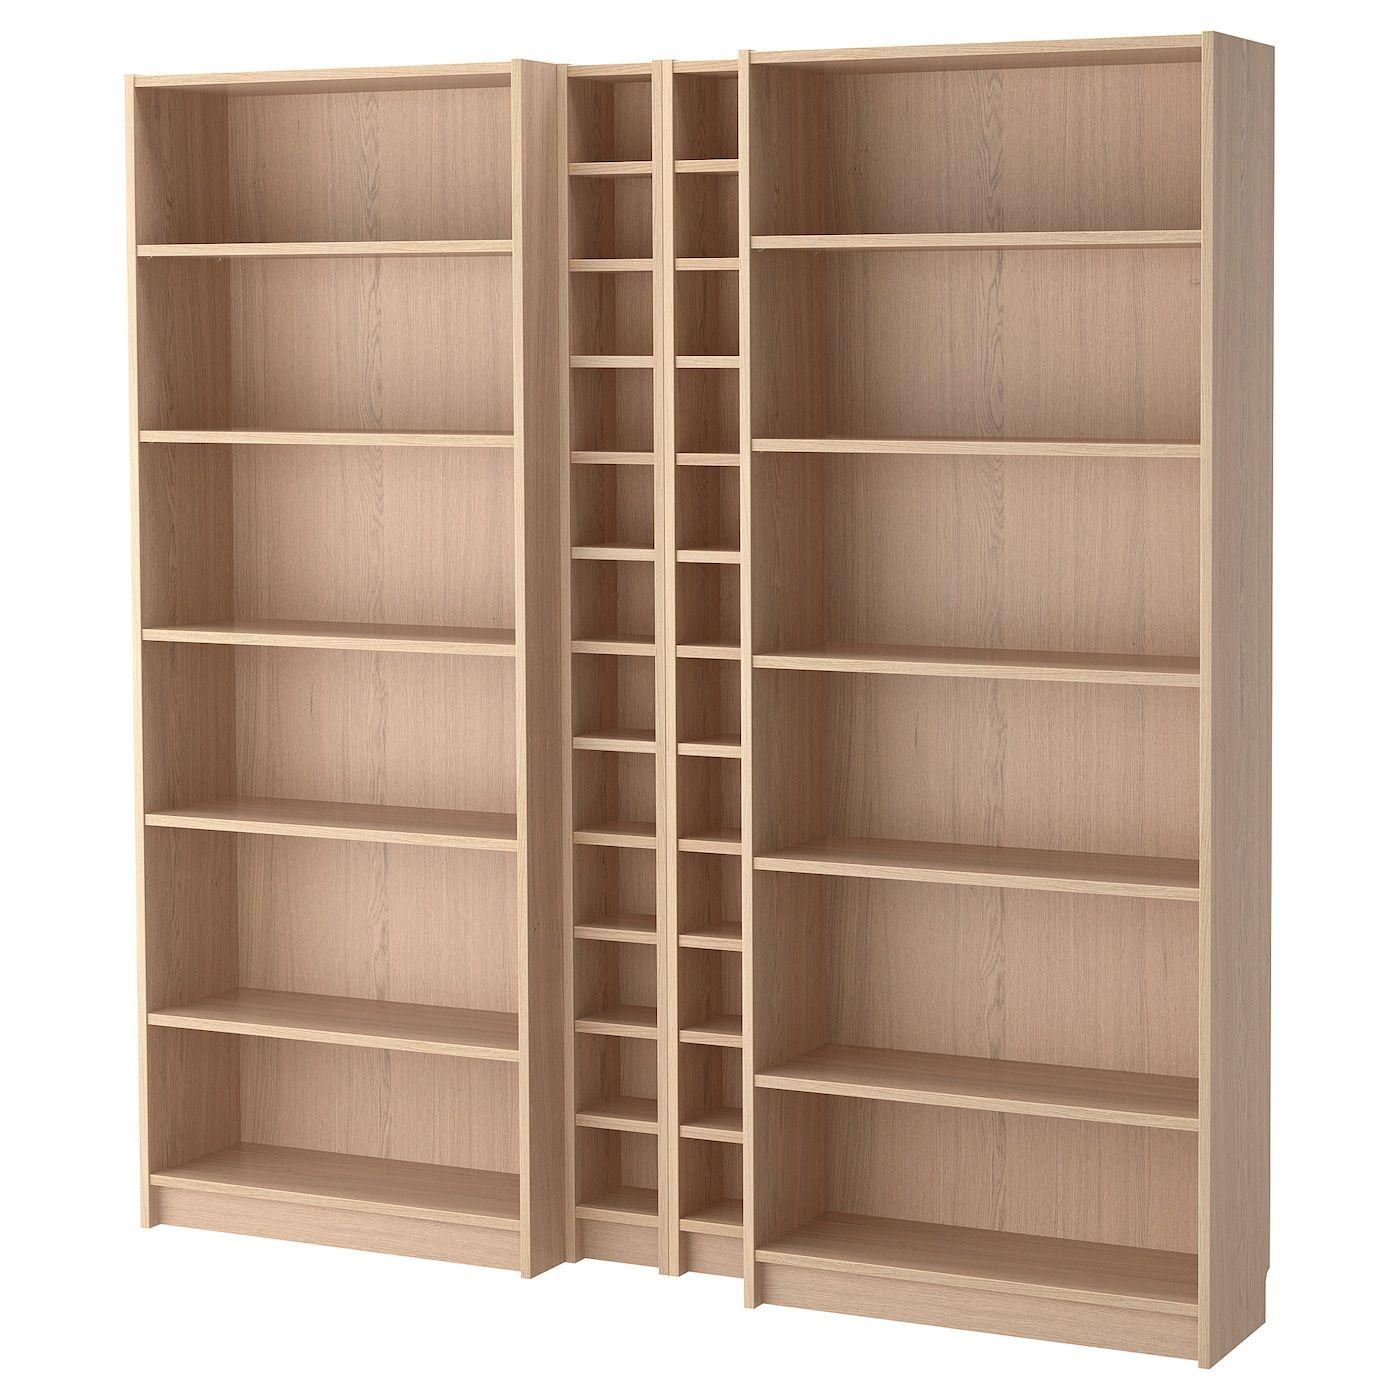 Billy Gnedby White Stained Oak Veneer Bookcase 200x28x202 Cm Ikea In 2020 Bucherschrank Ikea Bucherschrank Regal